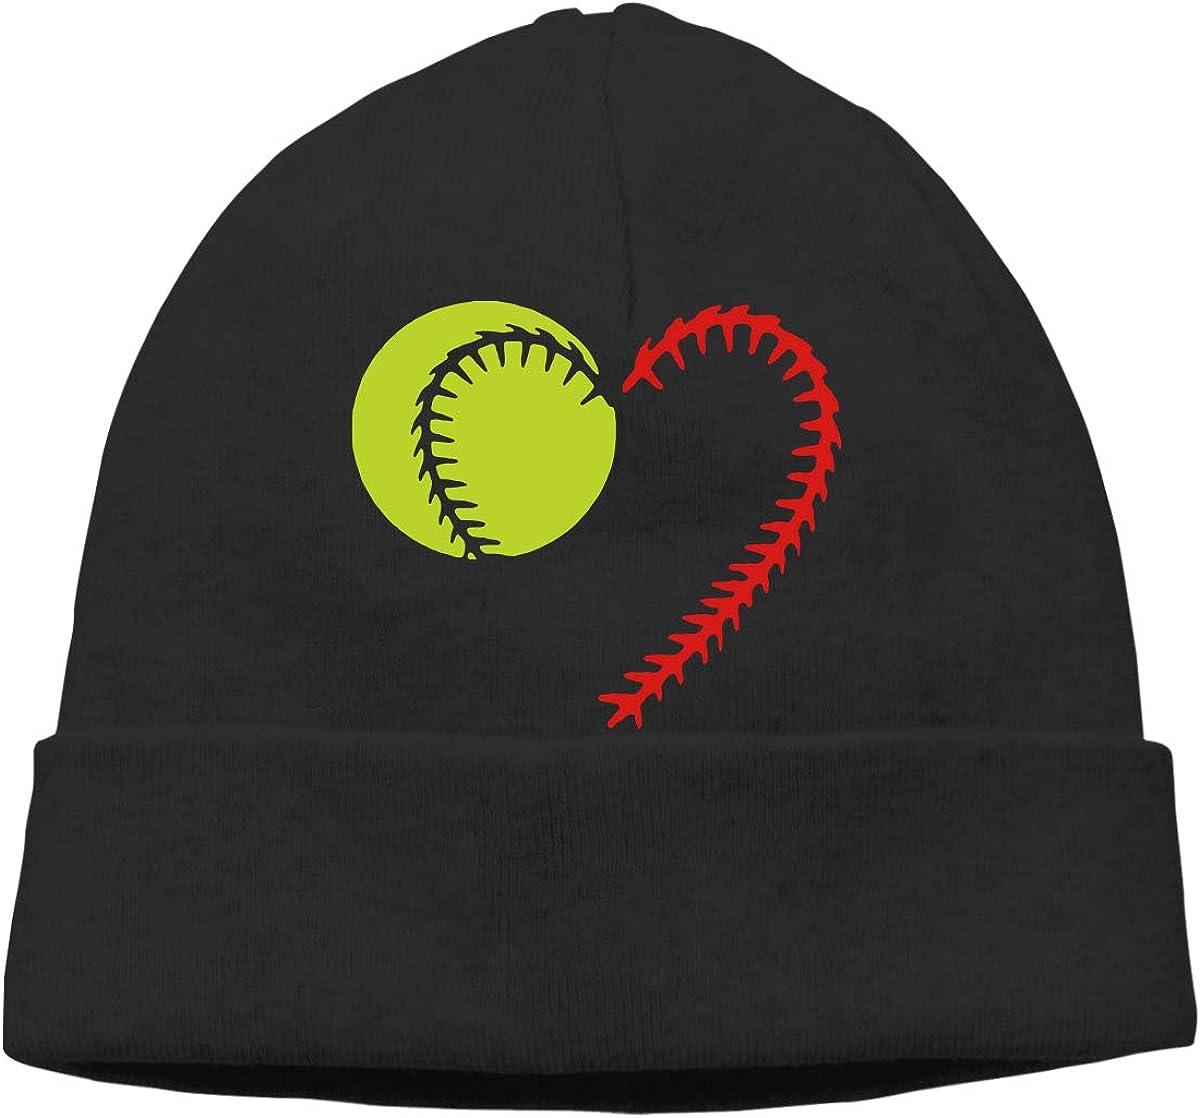 Mens and Womens Baseball Softball Lace Knitted Cap Comfortable Skiing Cap